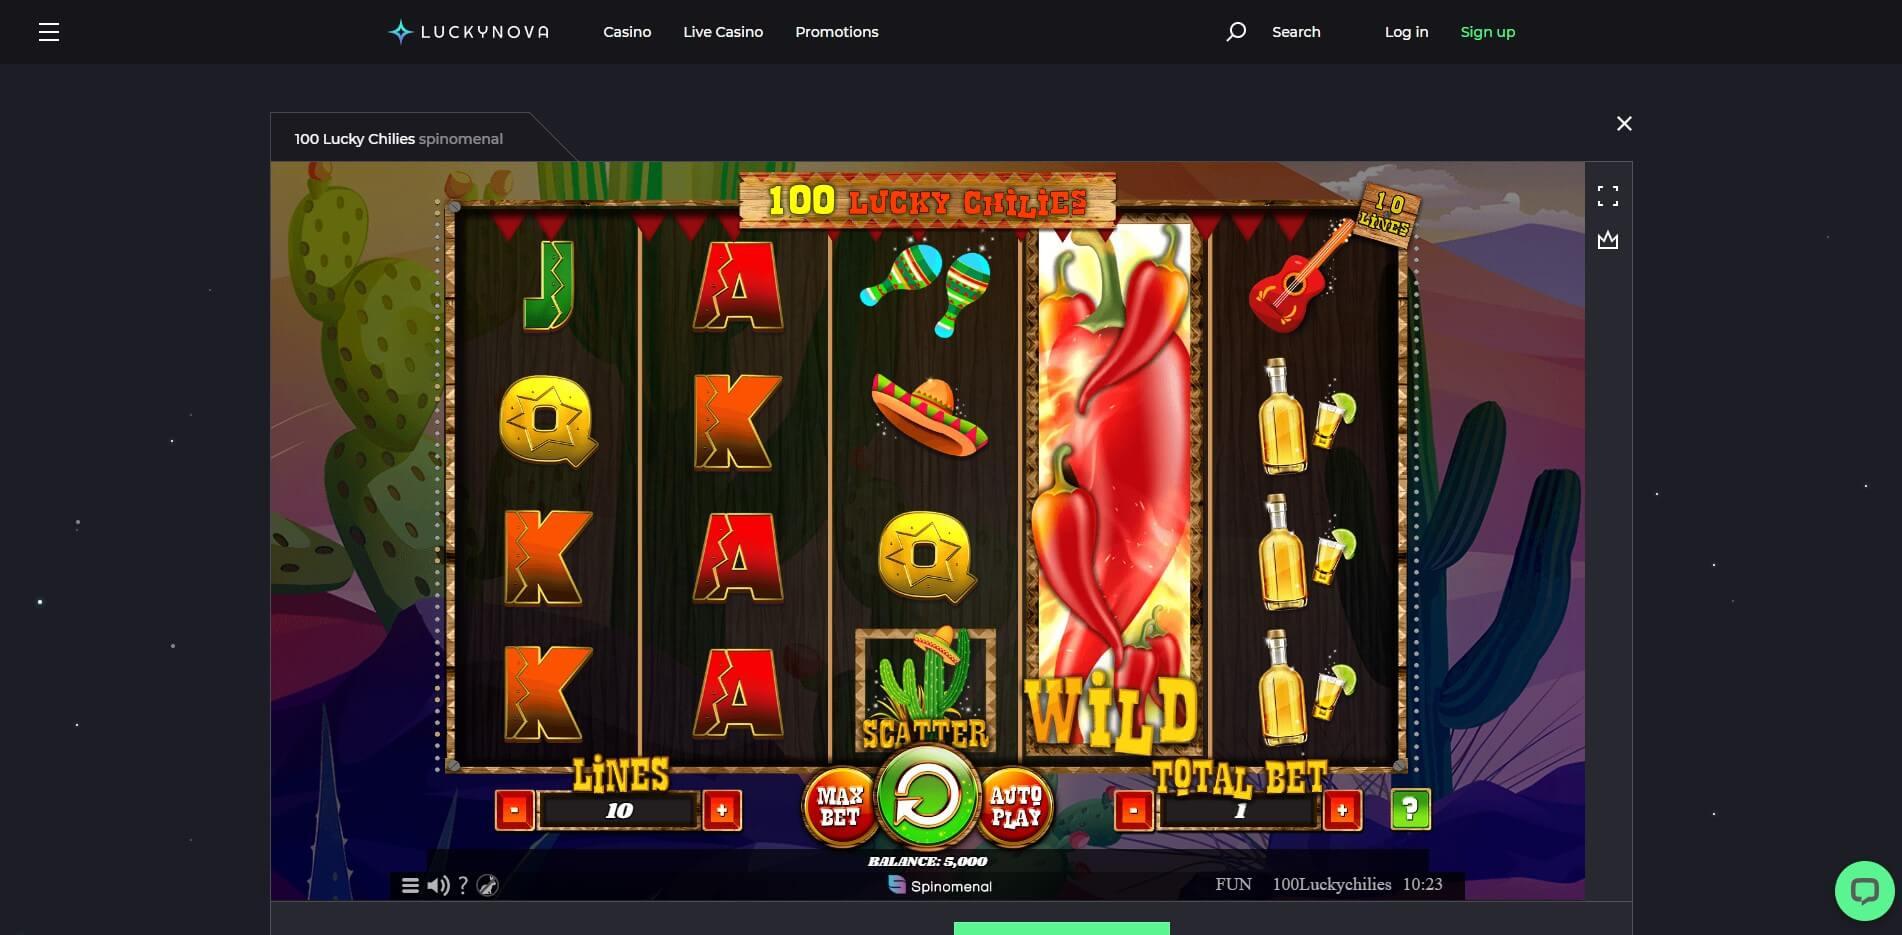 Game Play at LuckyNova Casino